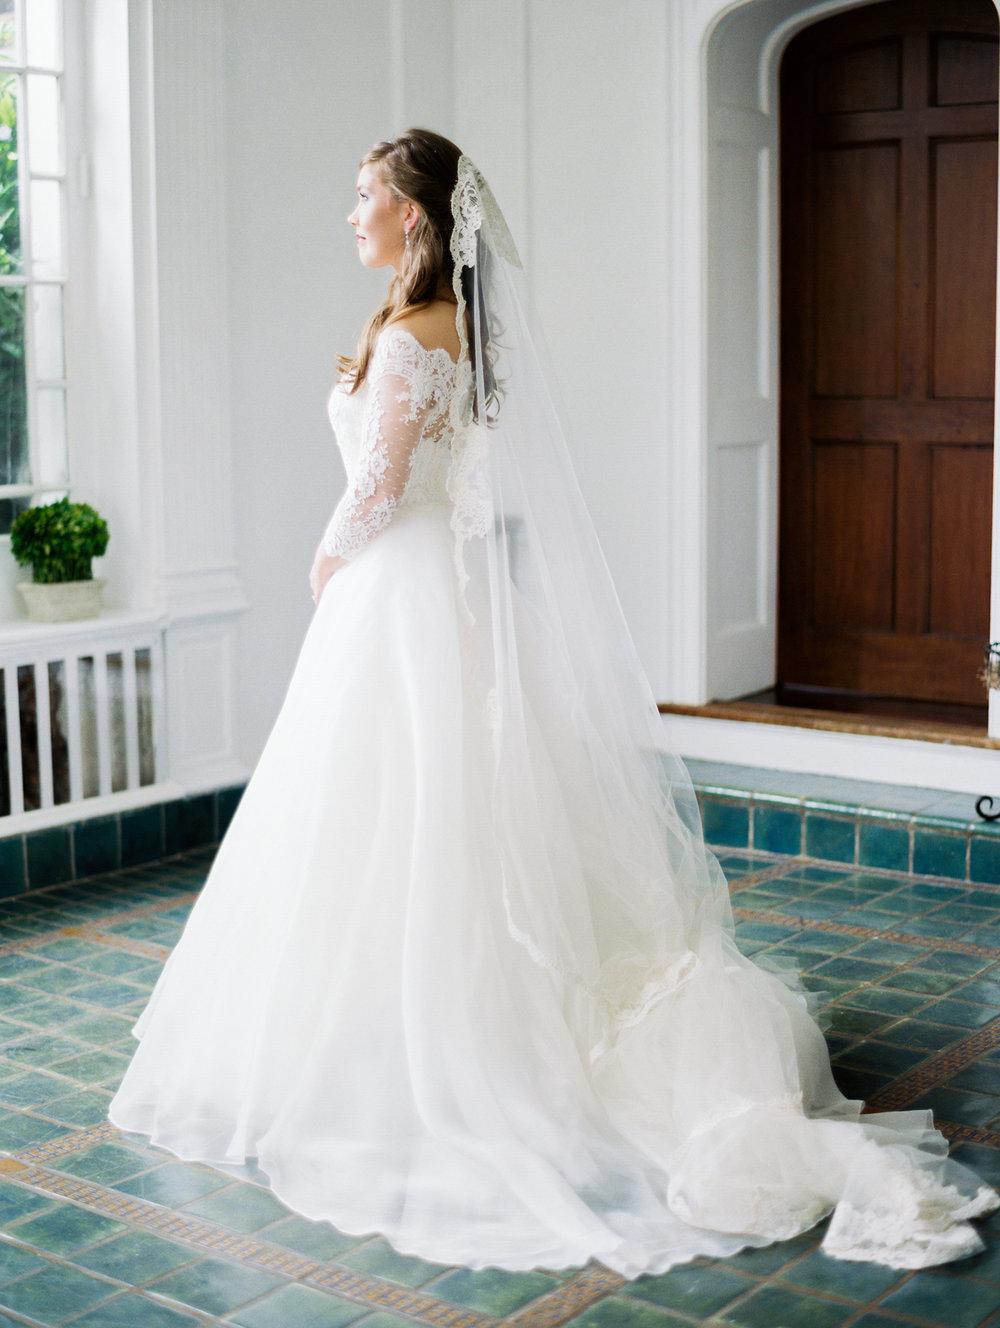 gassaway-mansion-greenville-south-carolina-luxury-film-wedding-photographer-11.jpg